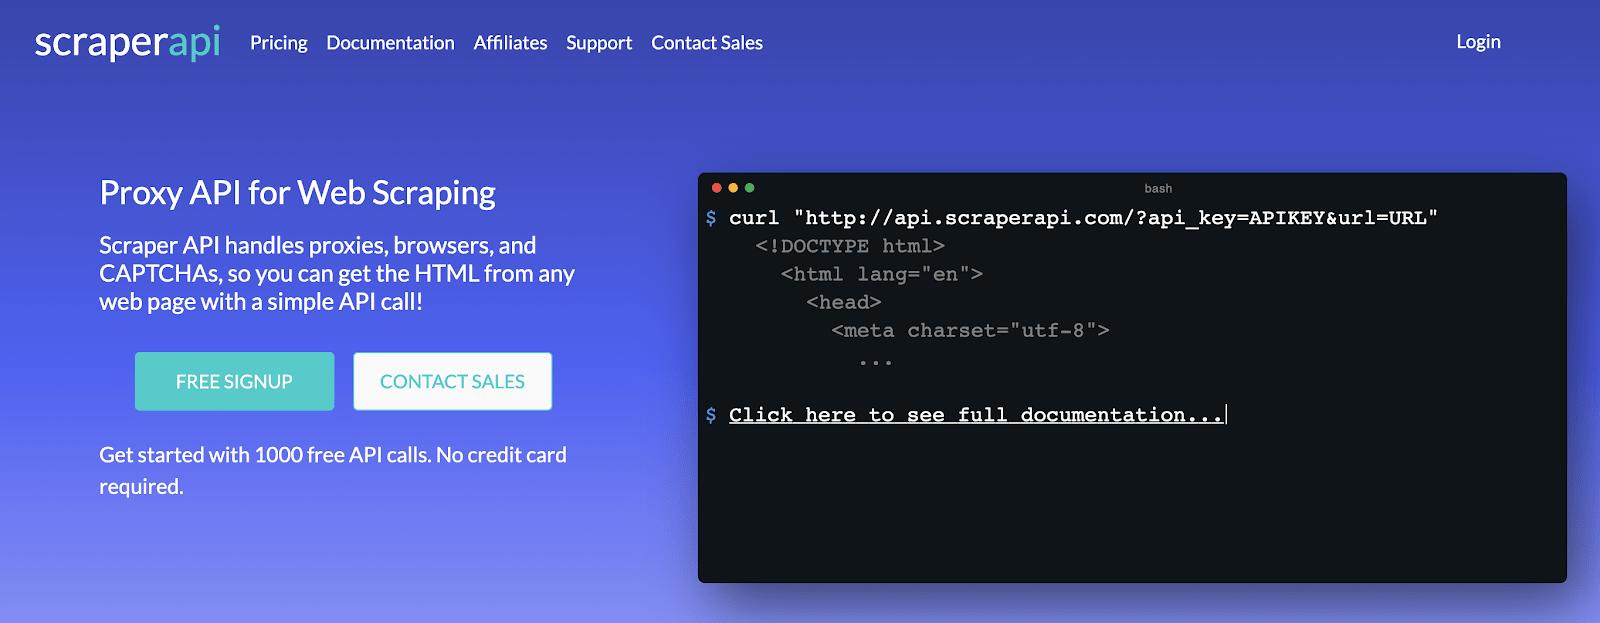 Scraper API Landing Page